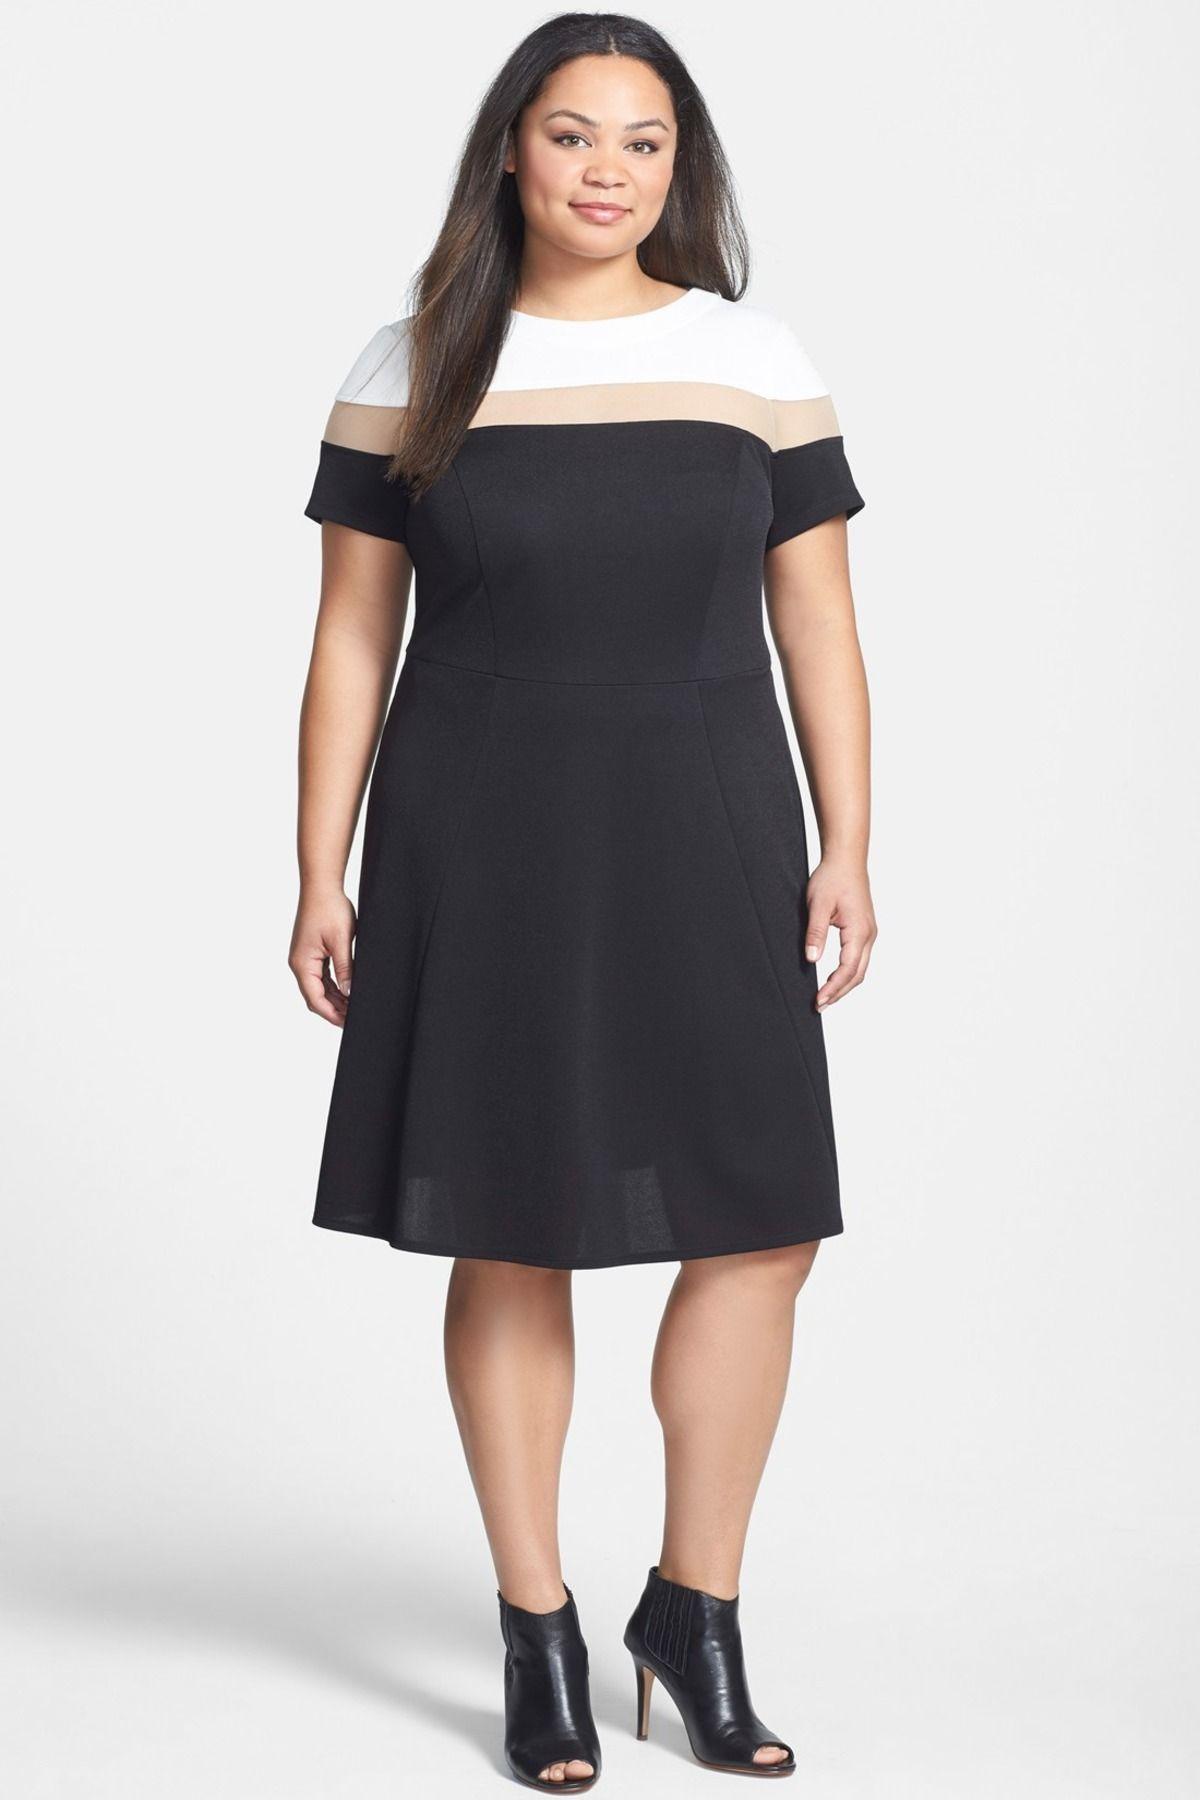 ABS Collection | Mesh Inset Colorblock Pique Knit Dress (Plus Size ...